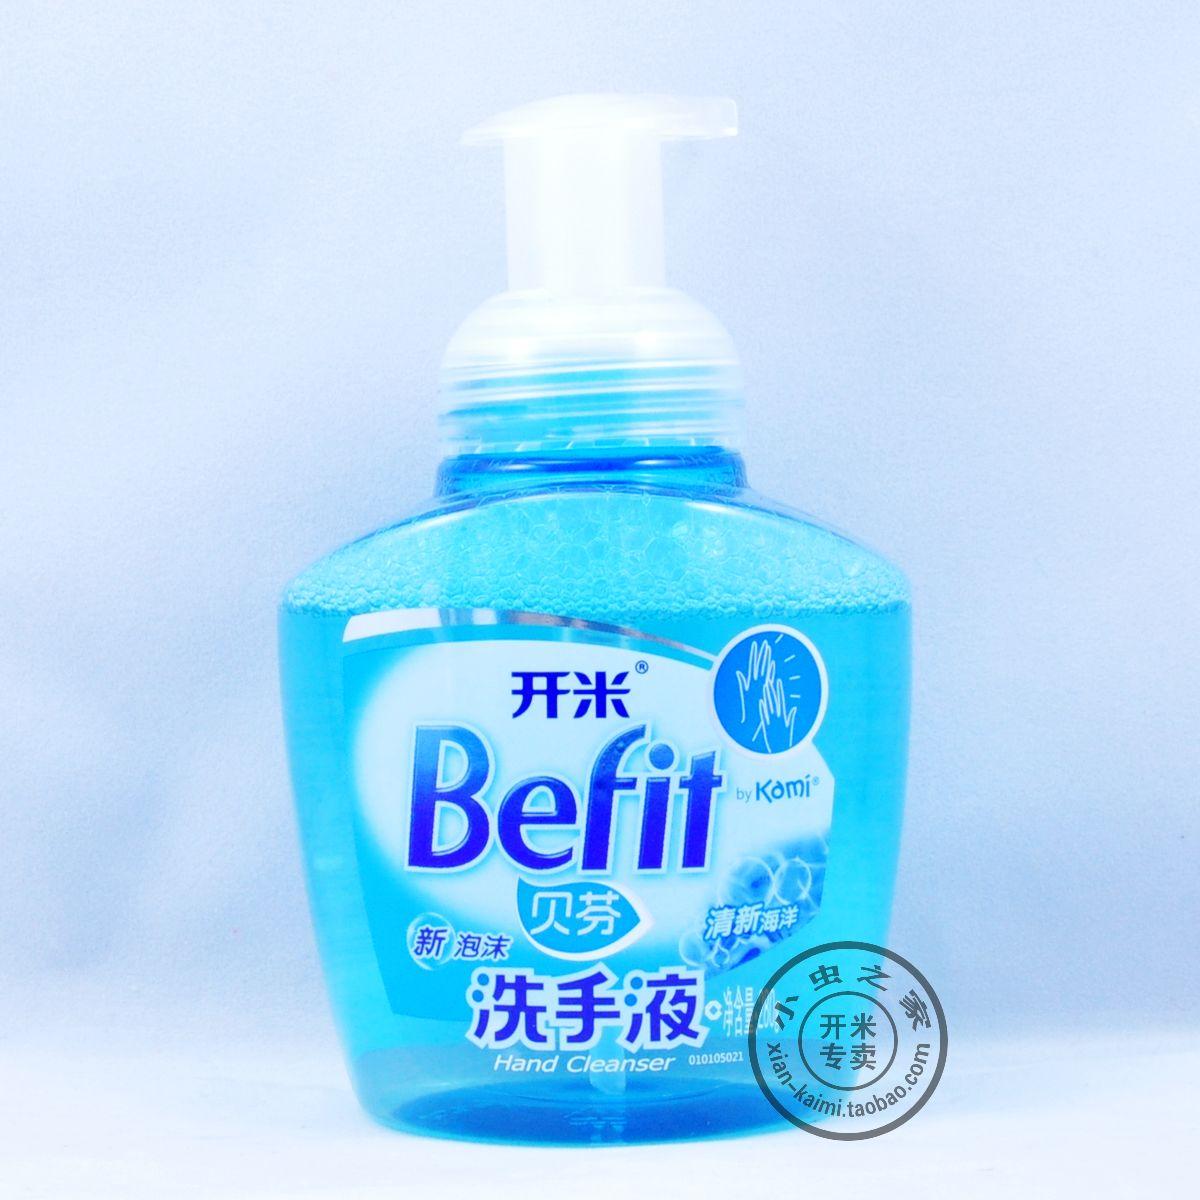 Kai maifen foam hand washing liquid 280g bottle, ocean freshness, childrens baby bacteriostatic hand guard, take 3 bottles, pack mail.